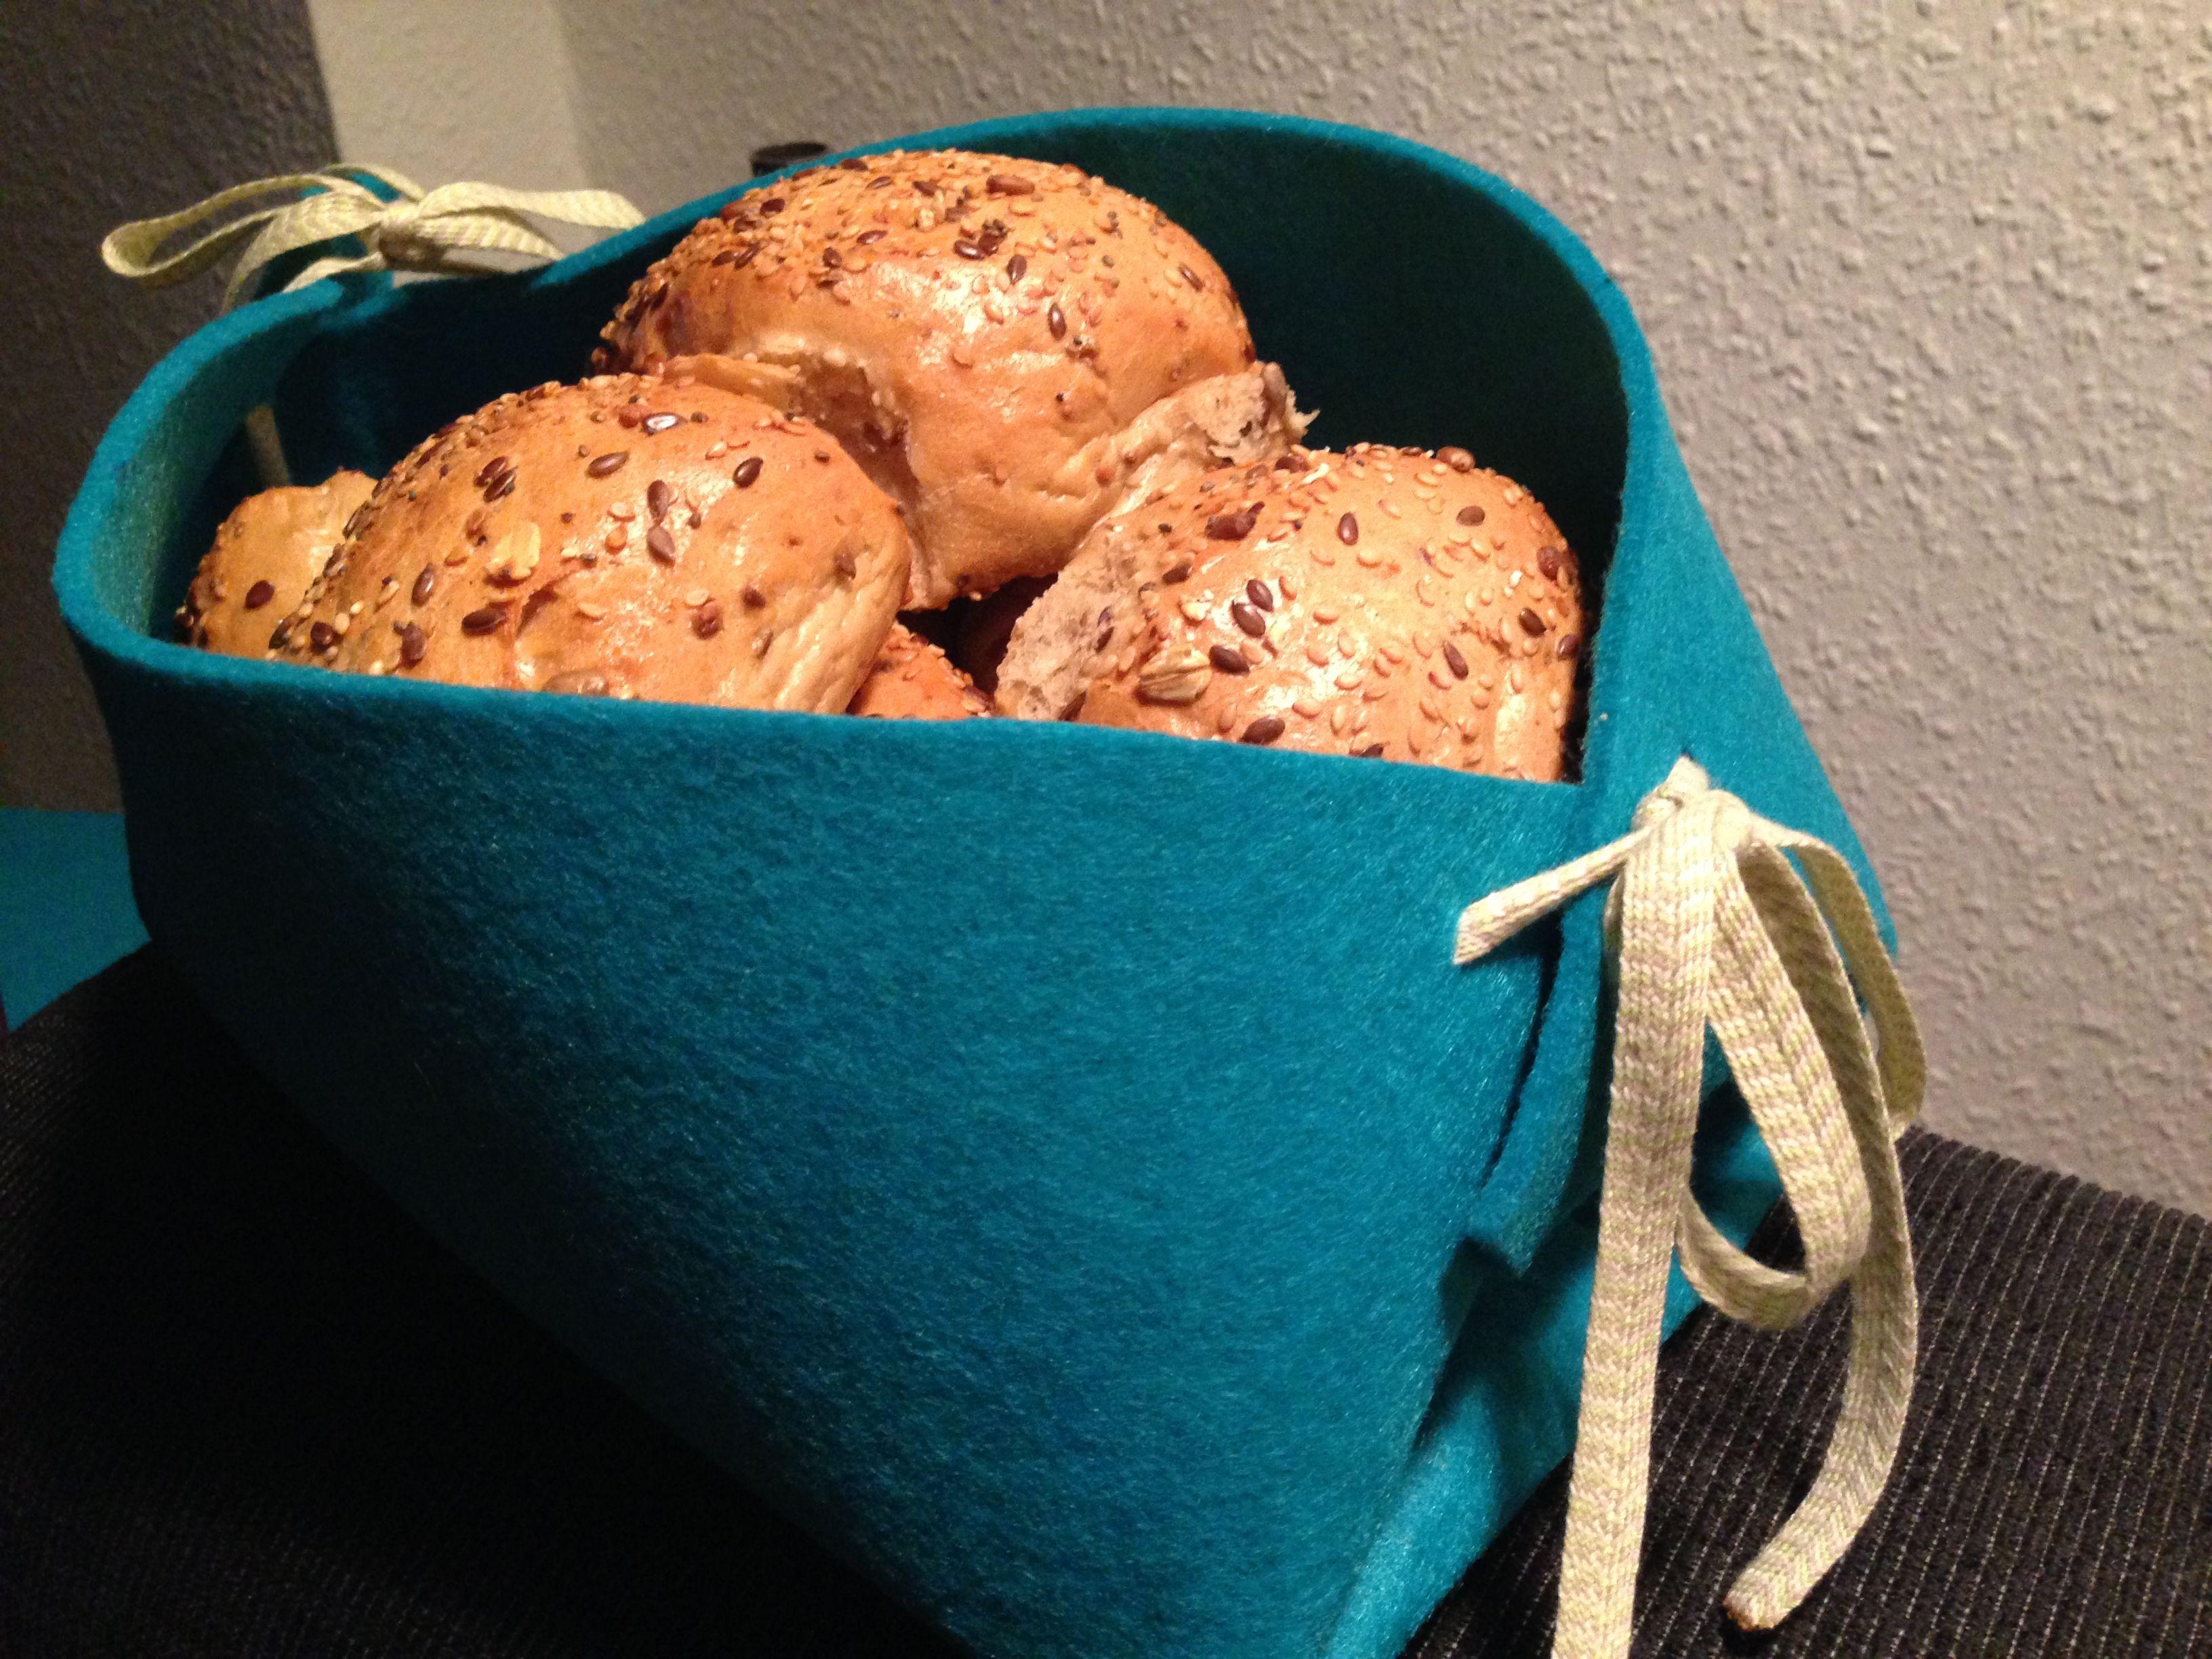 Hjemmelavede brødkurv i filt   DIY: http://www.pandurohobby.no/Inspirations/DmpInspirations/11/78796-Brodkurv-i-filt